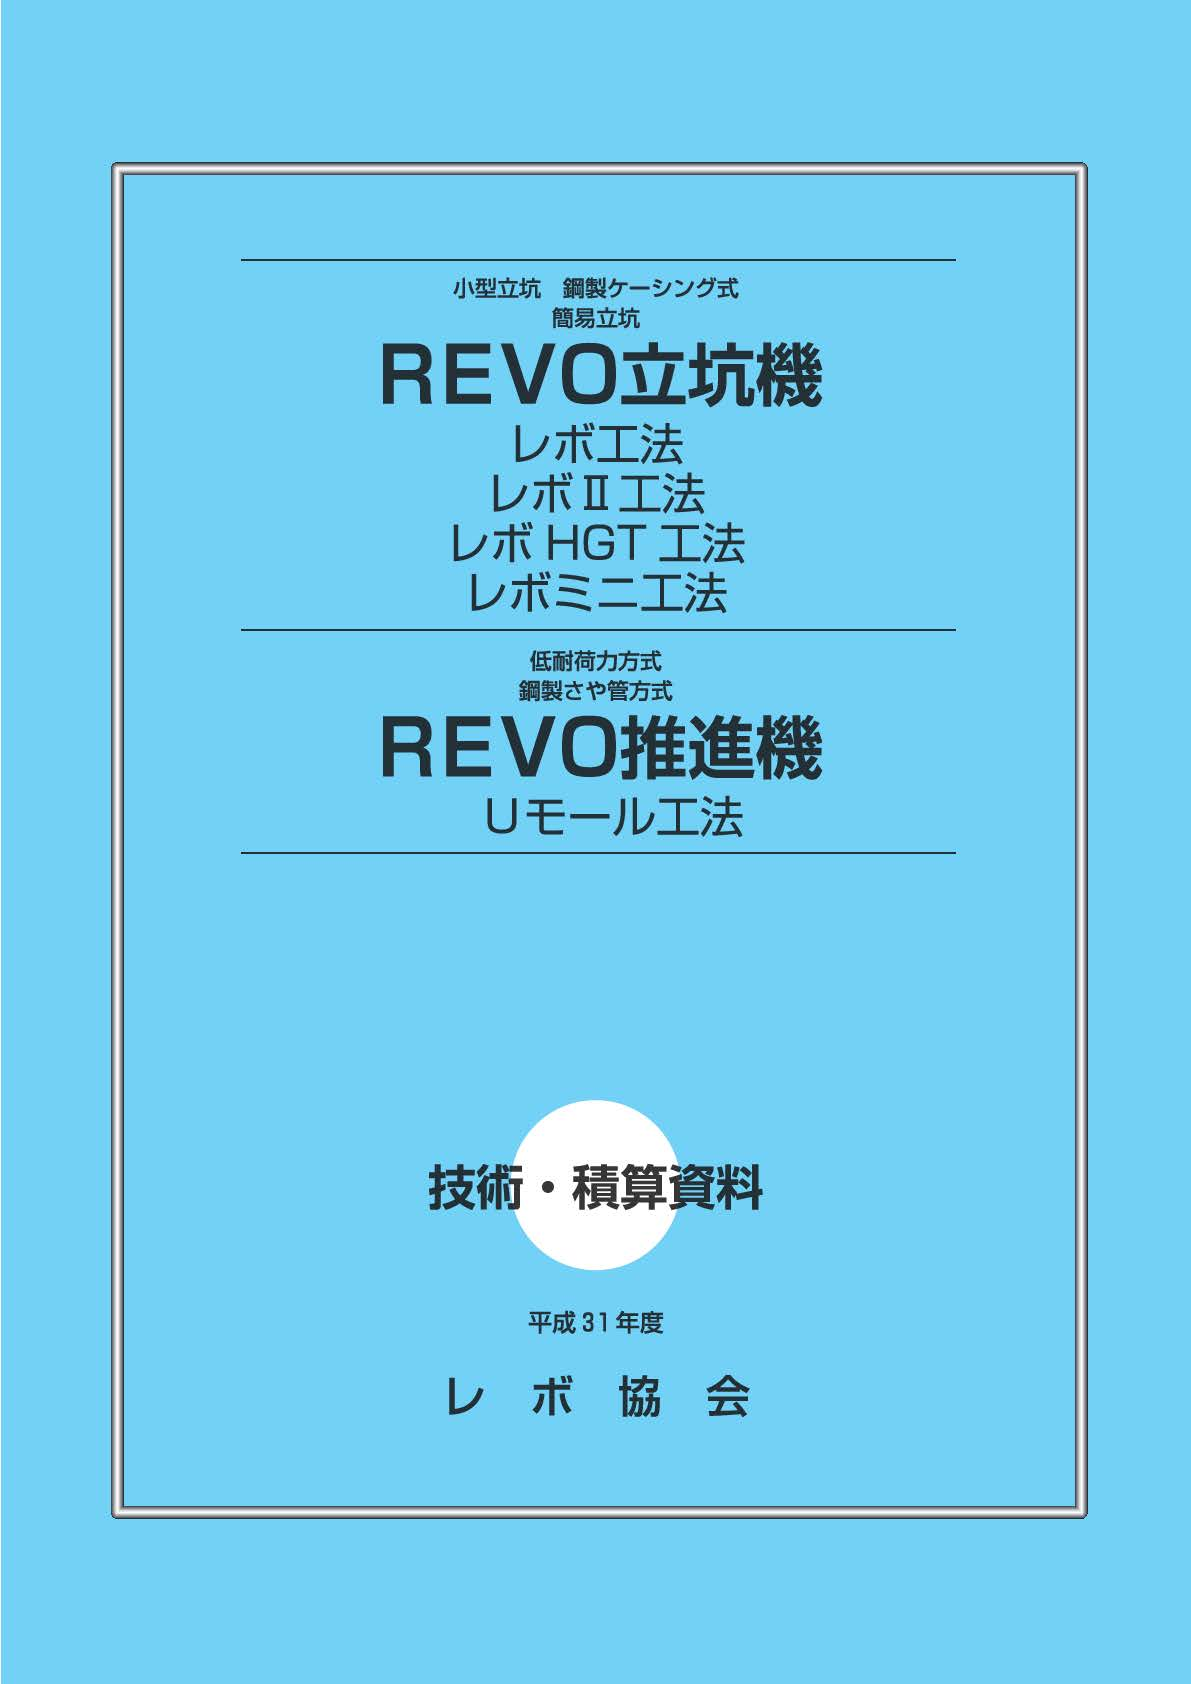 REVO2019-1_technique_ページ_01